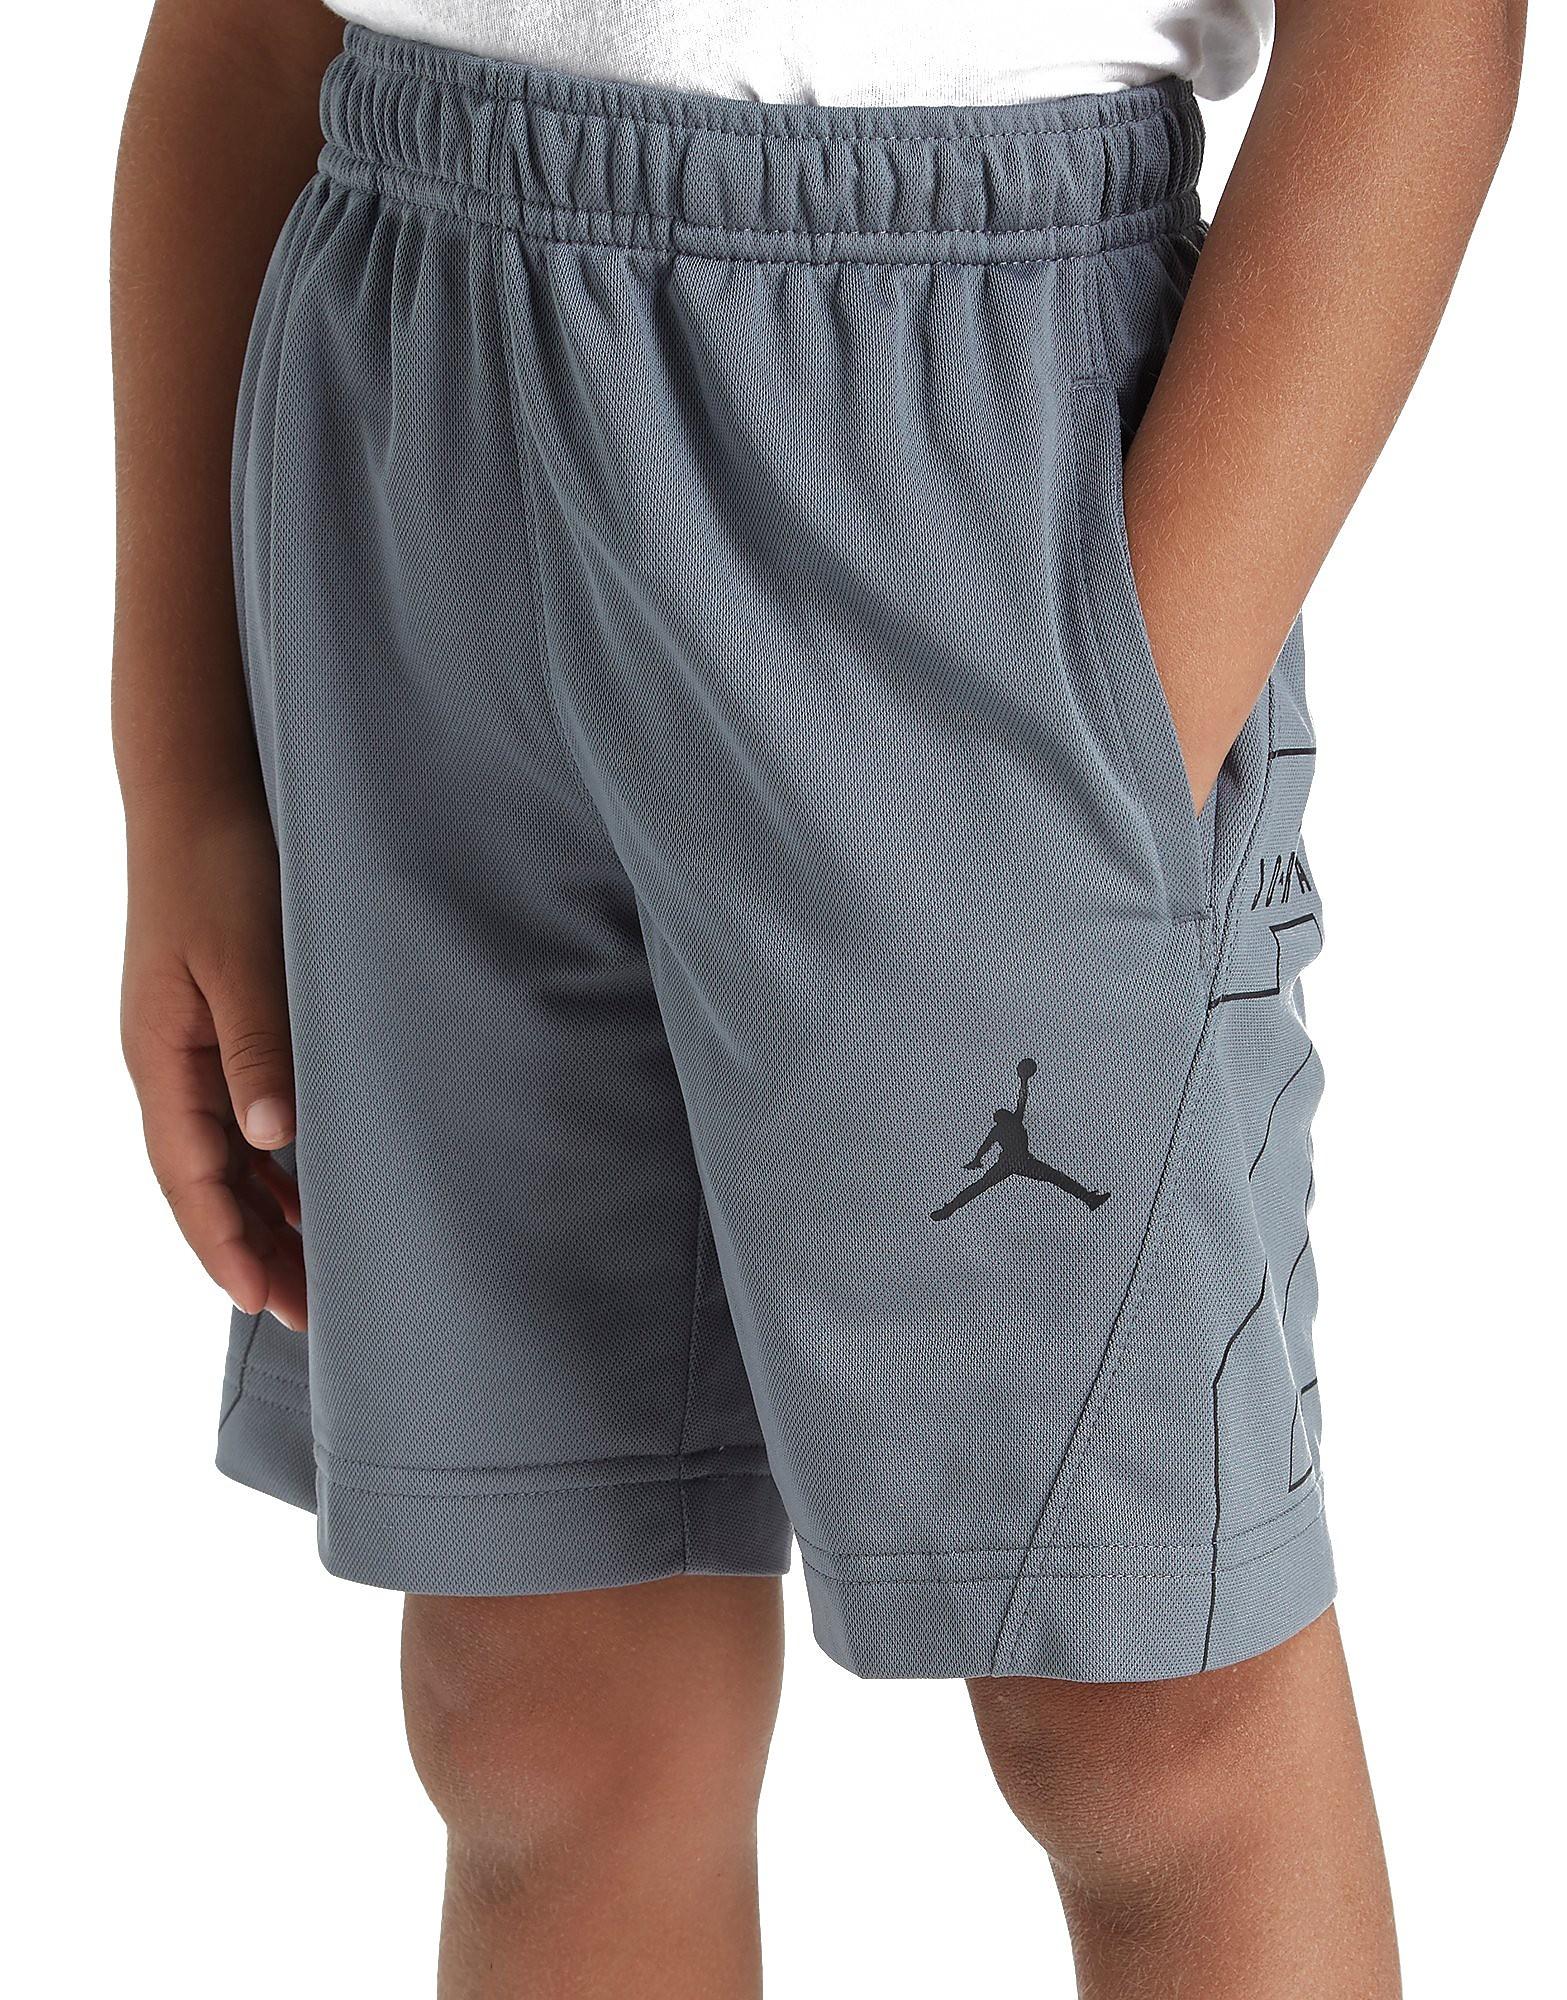 Jordan 23 Shorts Children